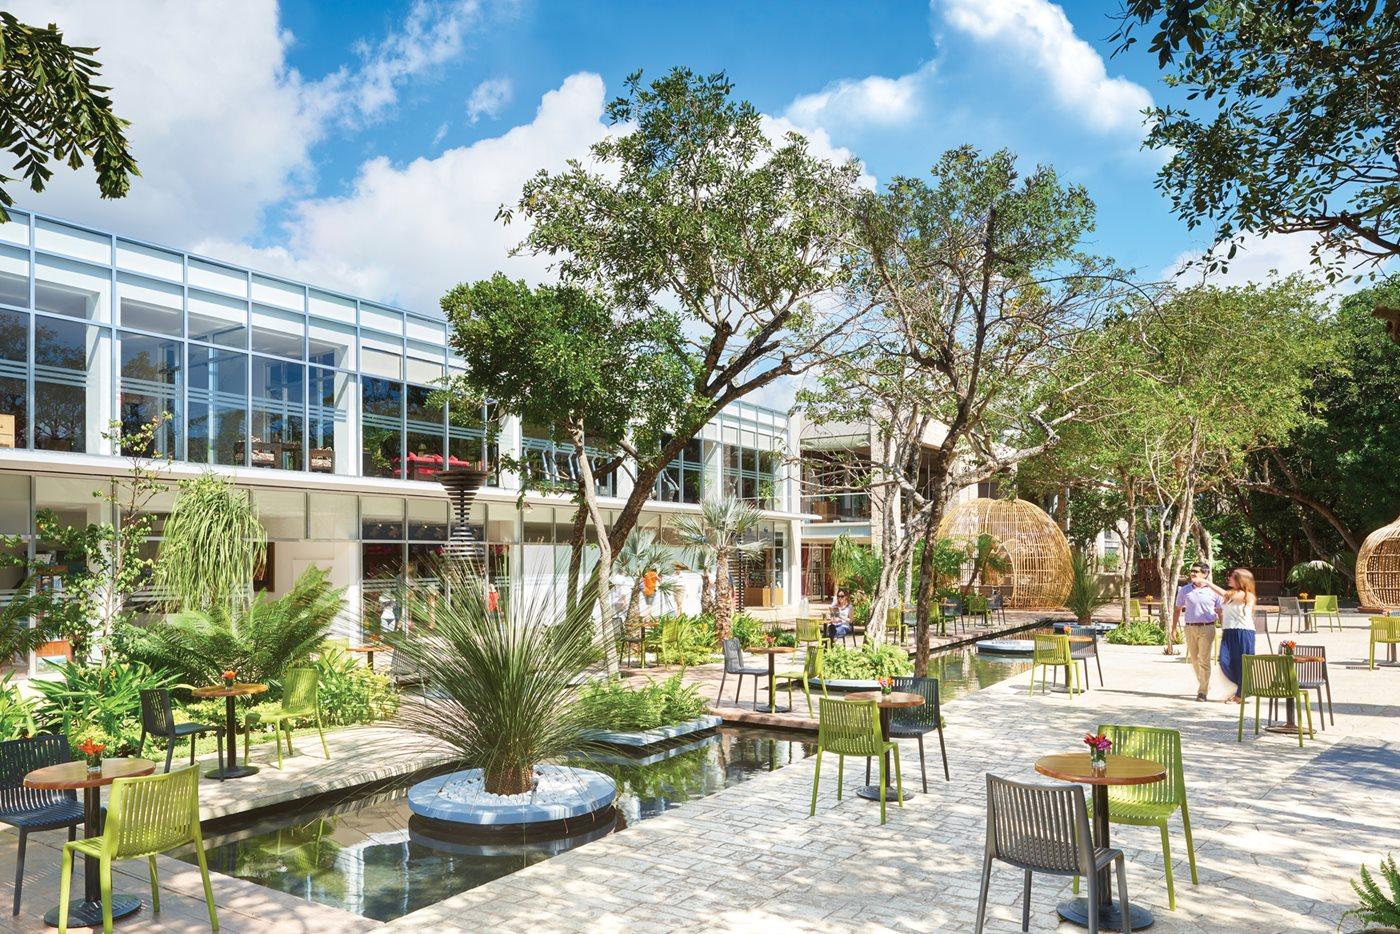 CUN-Fives-Azul-Beach-Hotel-Residence-Del-Carmen-Plaza-002